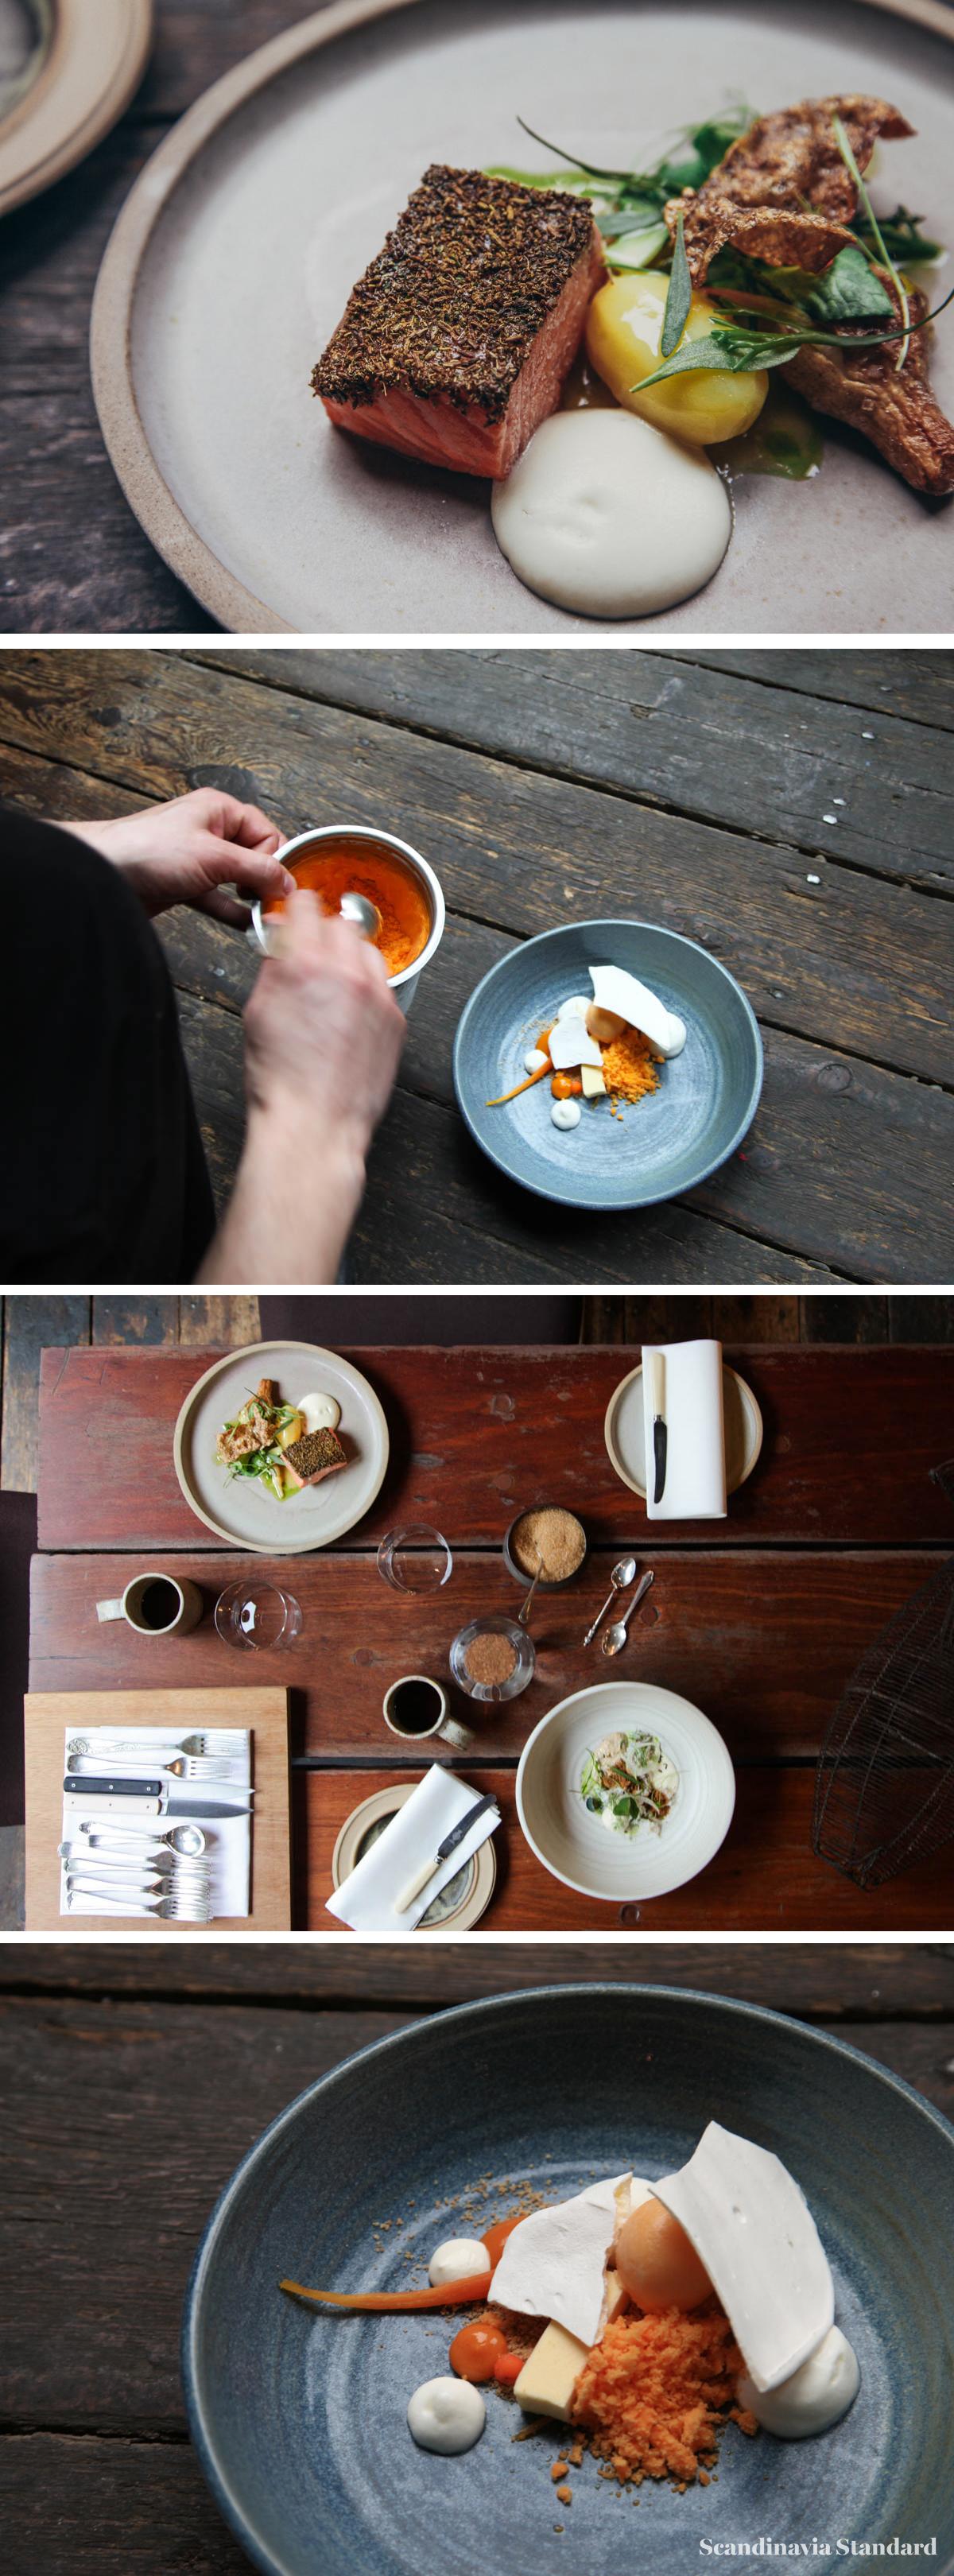 New Nordic in Old Edinburgh Timberyard Food Scandinavia Standard